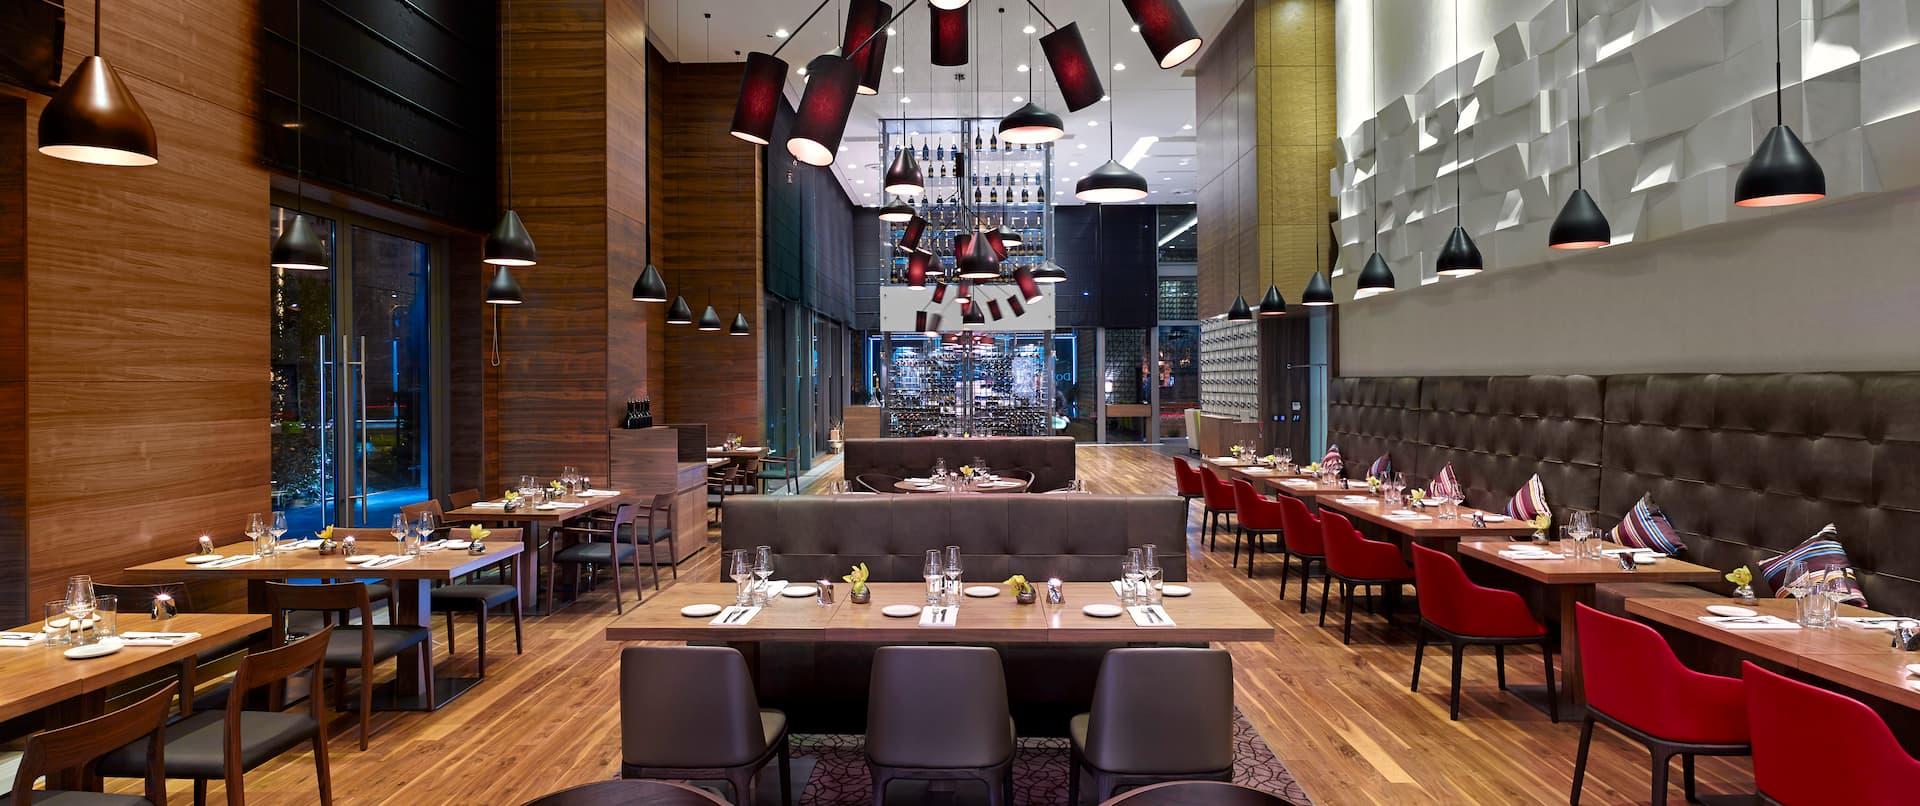 DoubleTree by Hilton Hotel Zagreb, Croatia - Oxbo Urban Bar & Grill